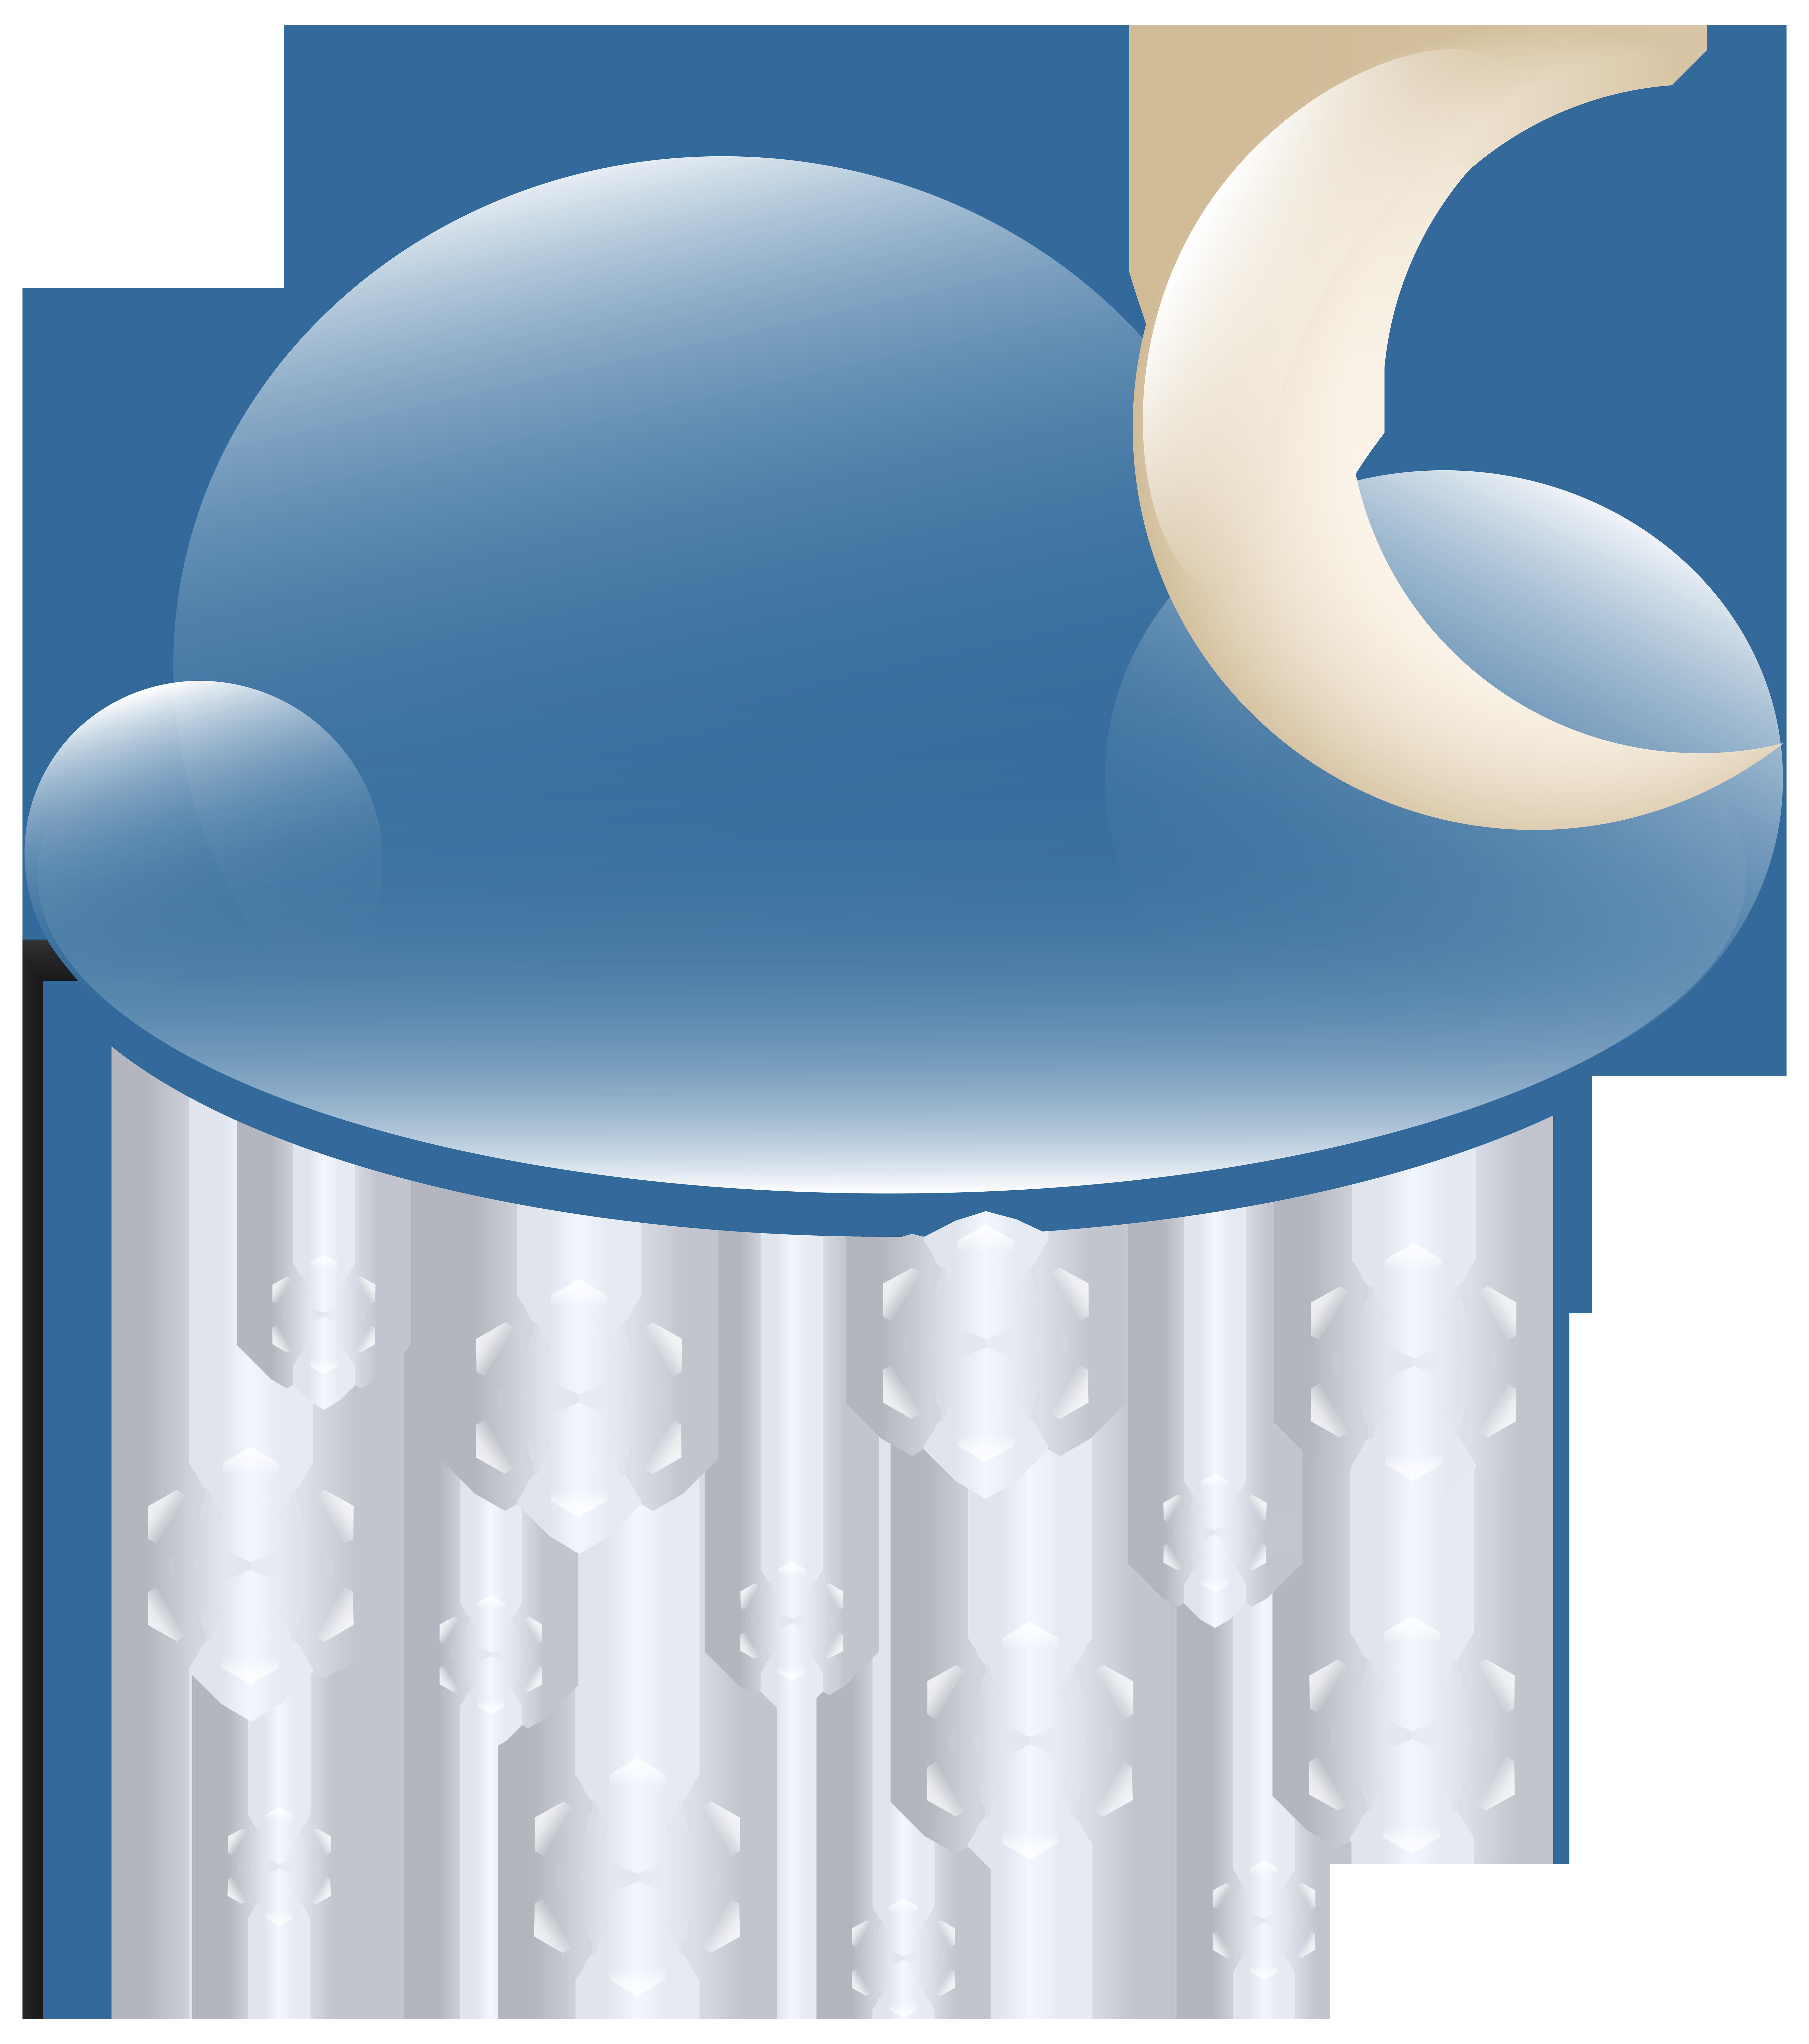 Clipart sun night. Snowy cloud weather icon